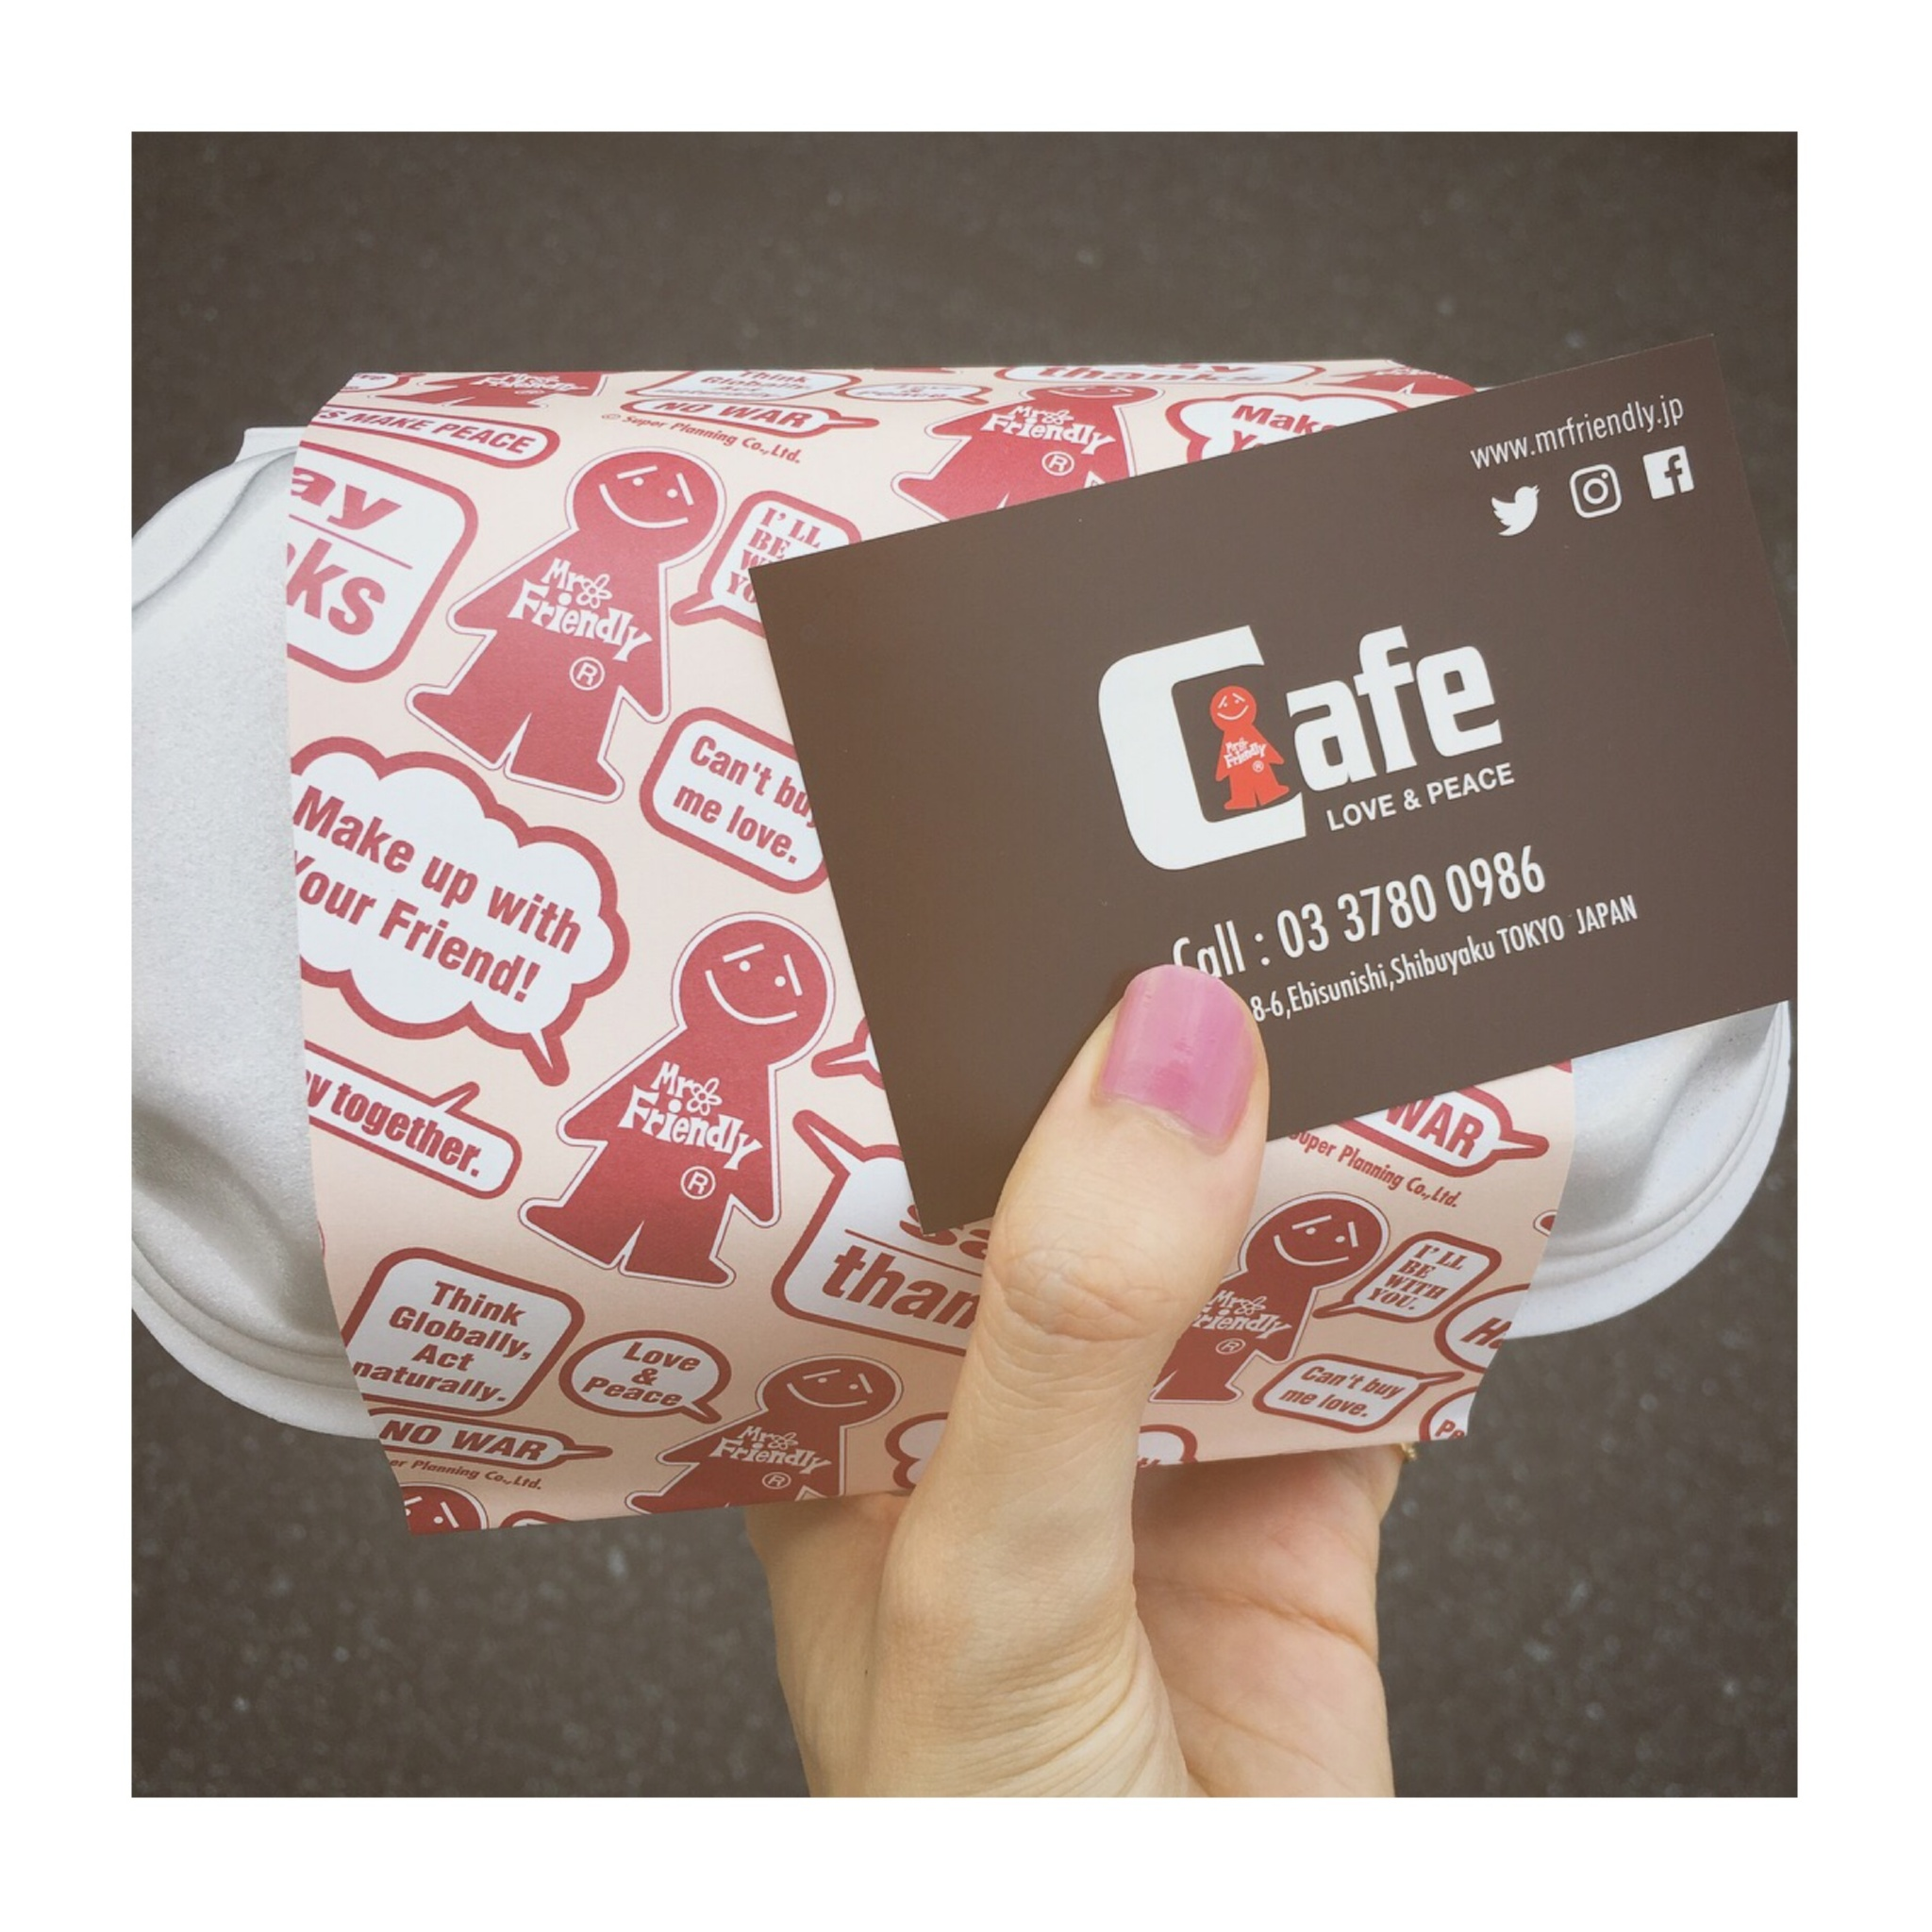 #3【#cafestagram】❤️:お店の中から外までとにかくかわいい!《代官山》MR. FRIENDLY CAFE☻_5